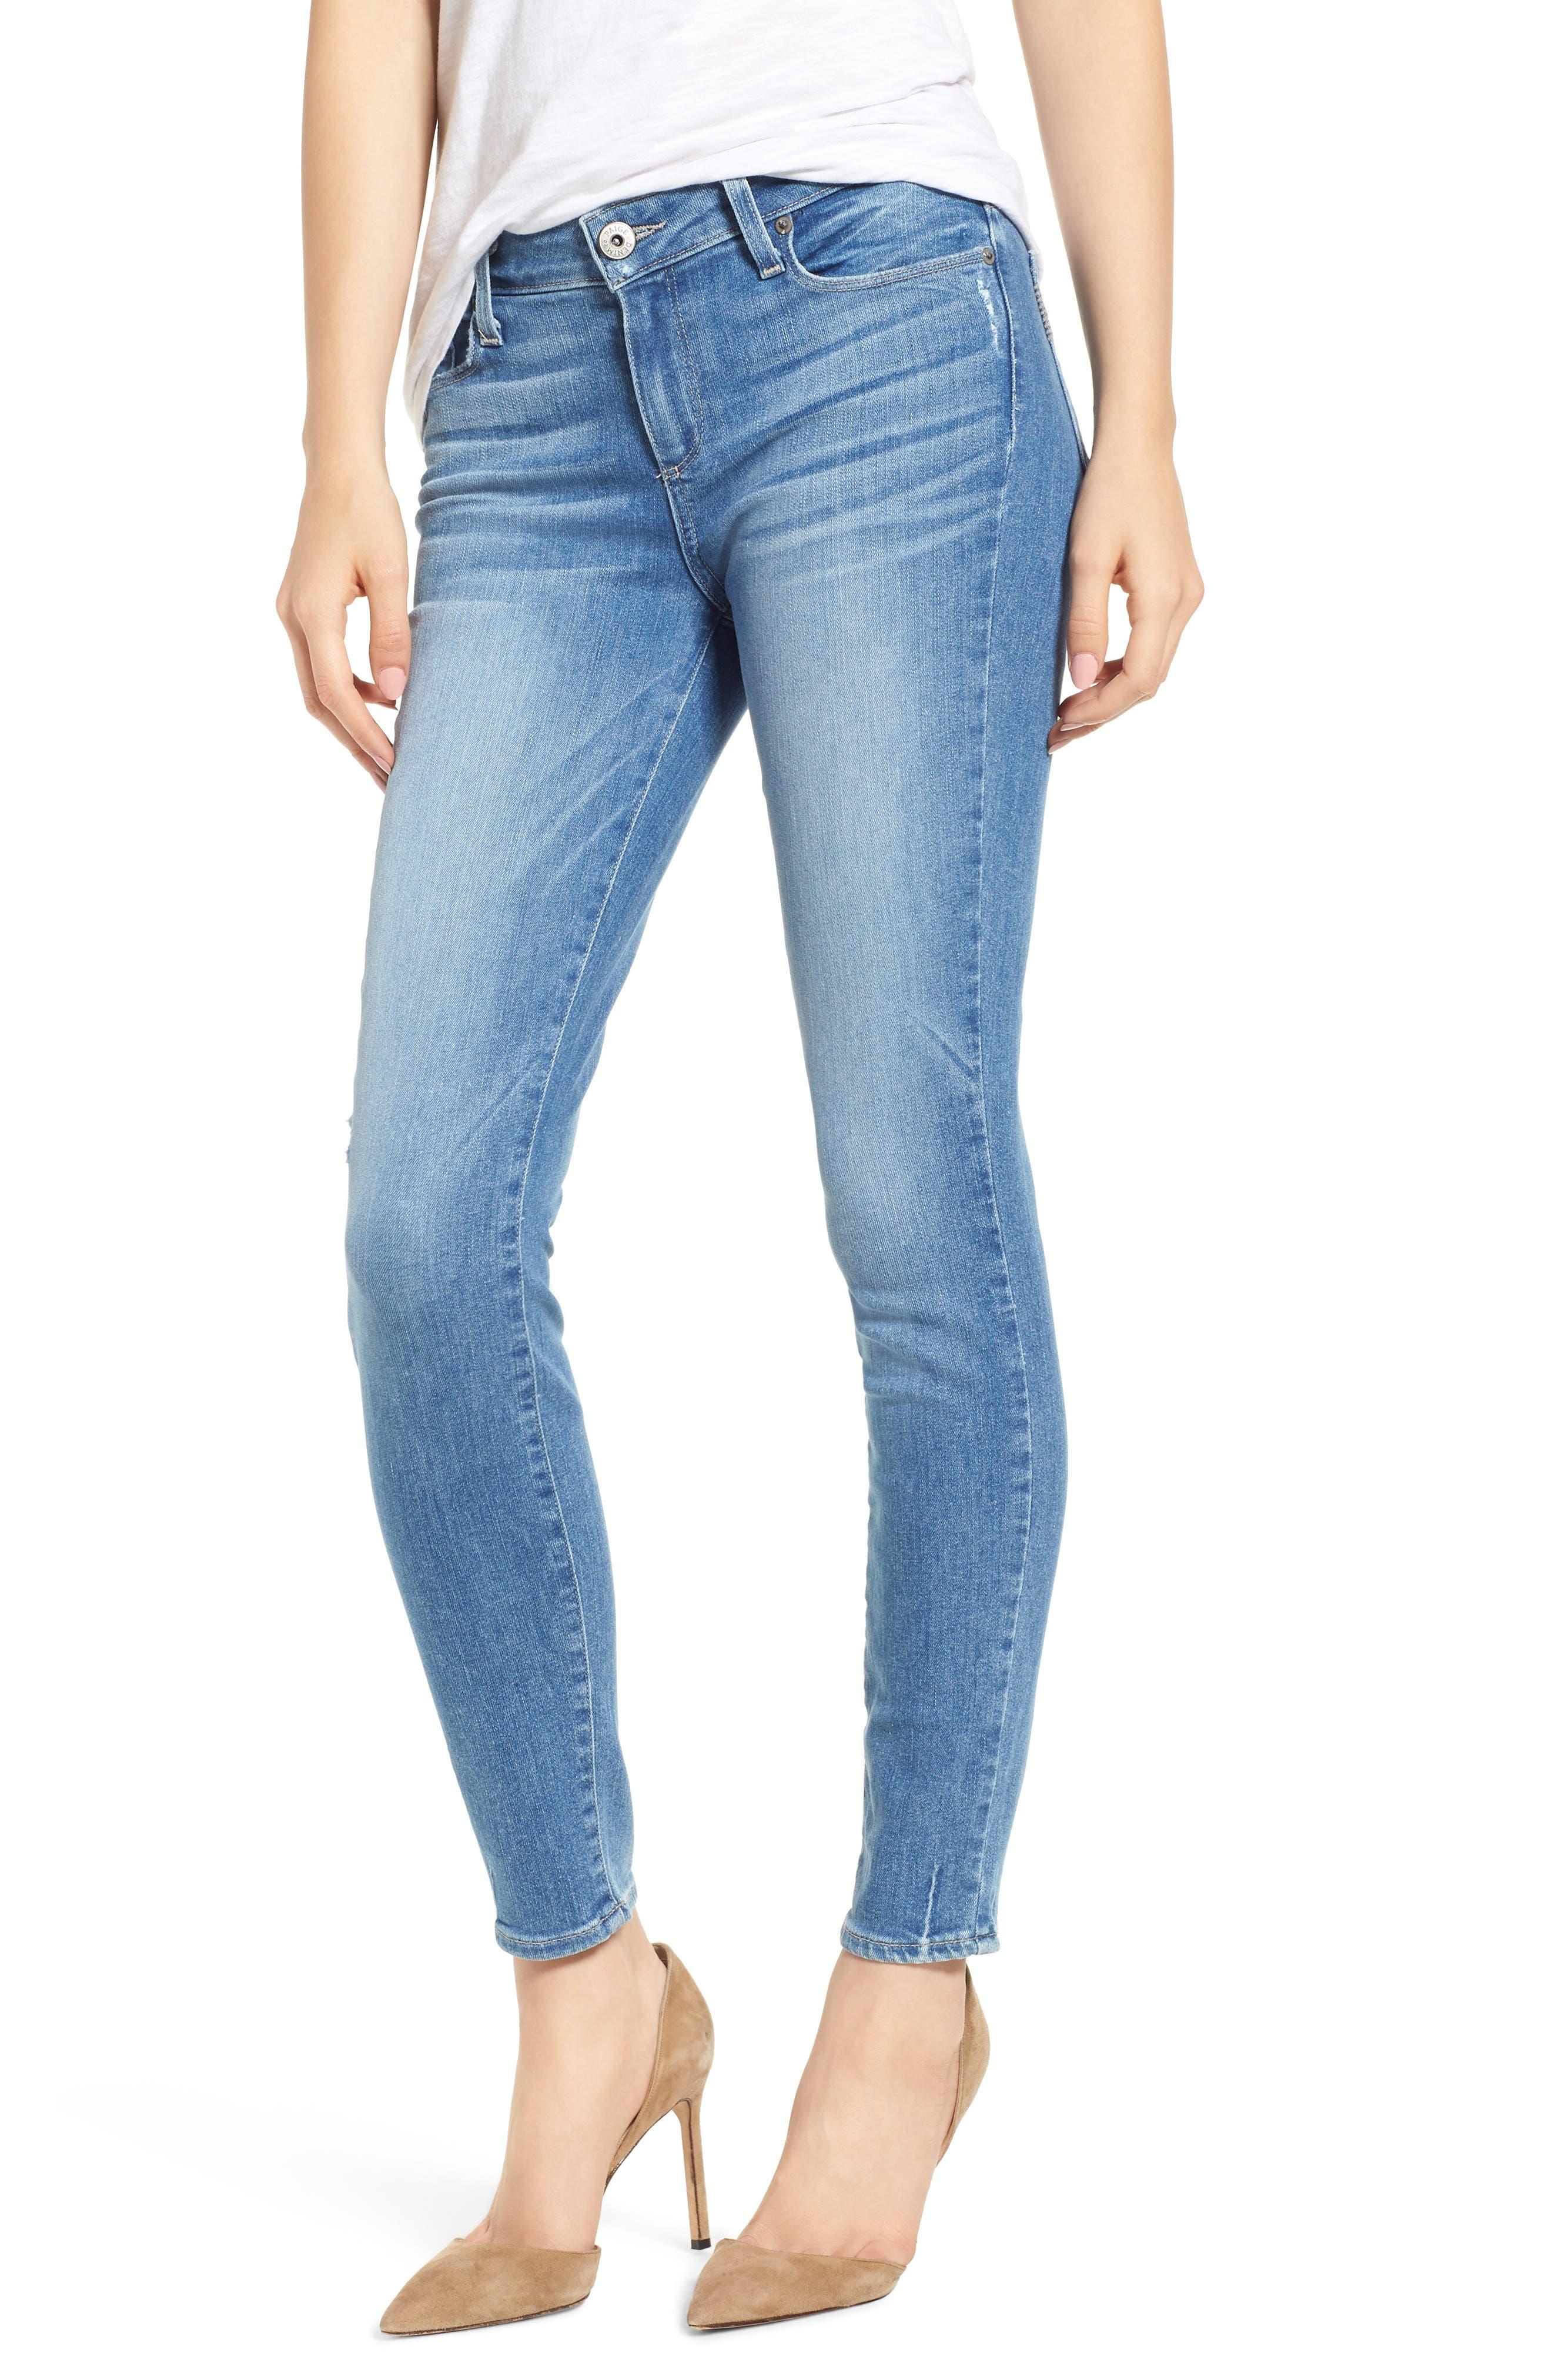 Transcend Vintage - Verdugo Ultra Skinny Jeans,                             Main thumbnail 1, color,                             Atterbury